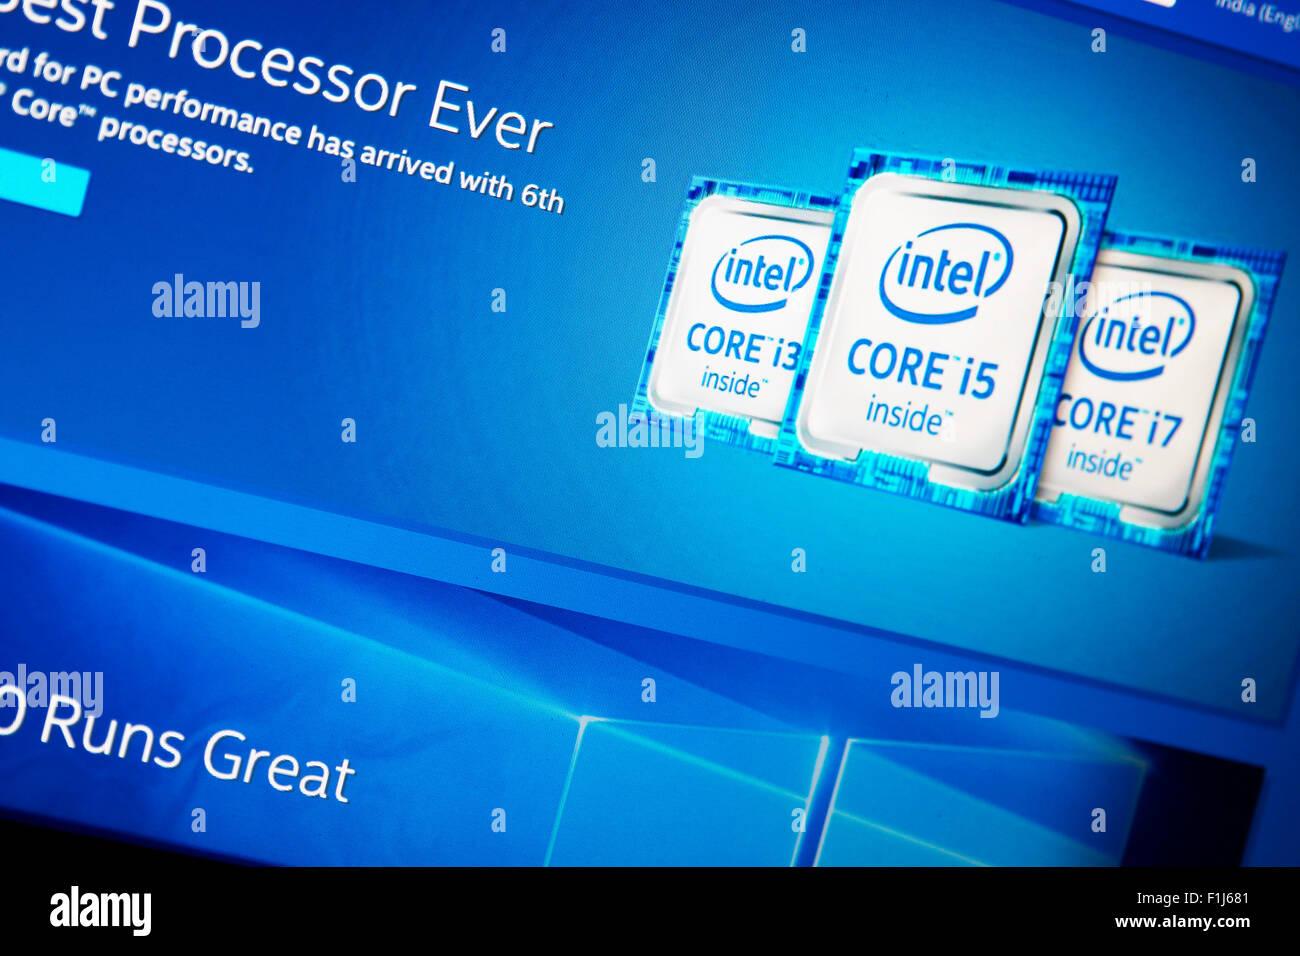 Intel Processors - Stock Image